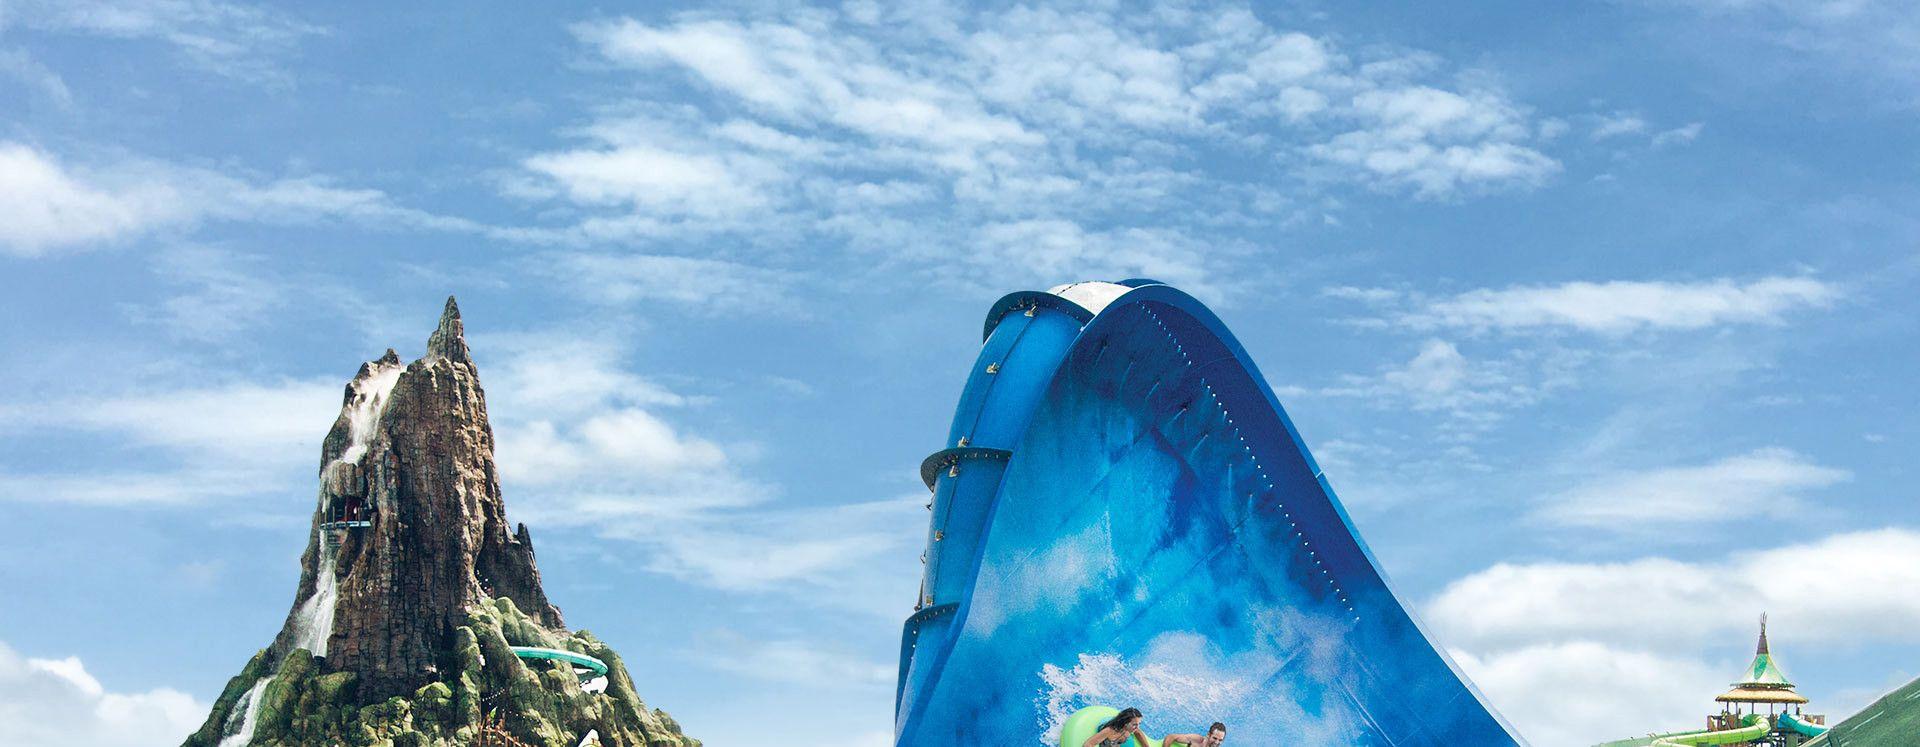 Universal's Volcano Bay™ Honu Ika Moana slides